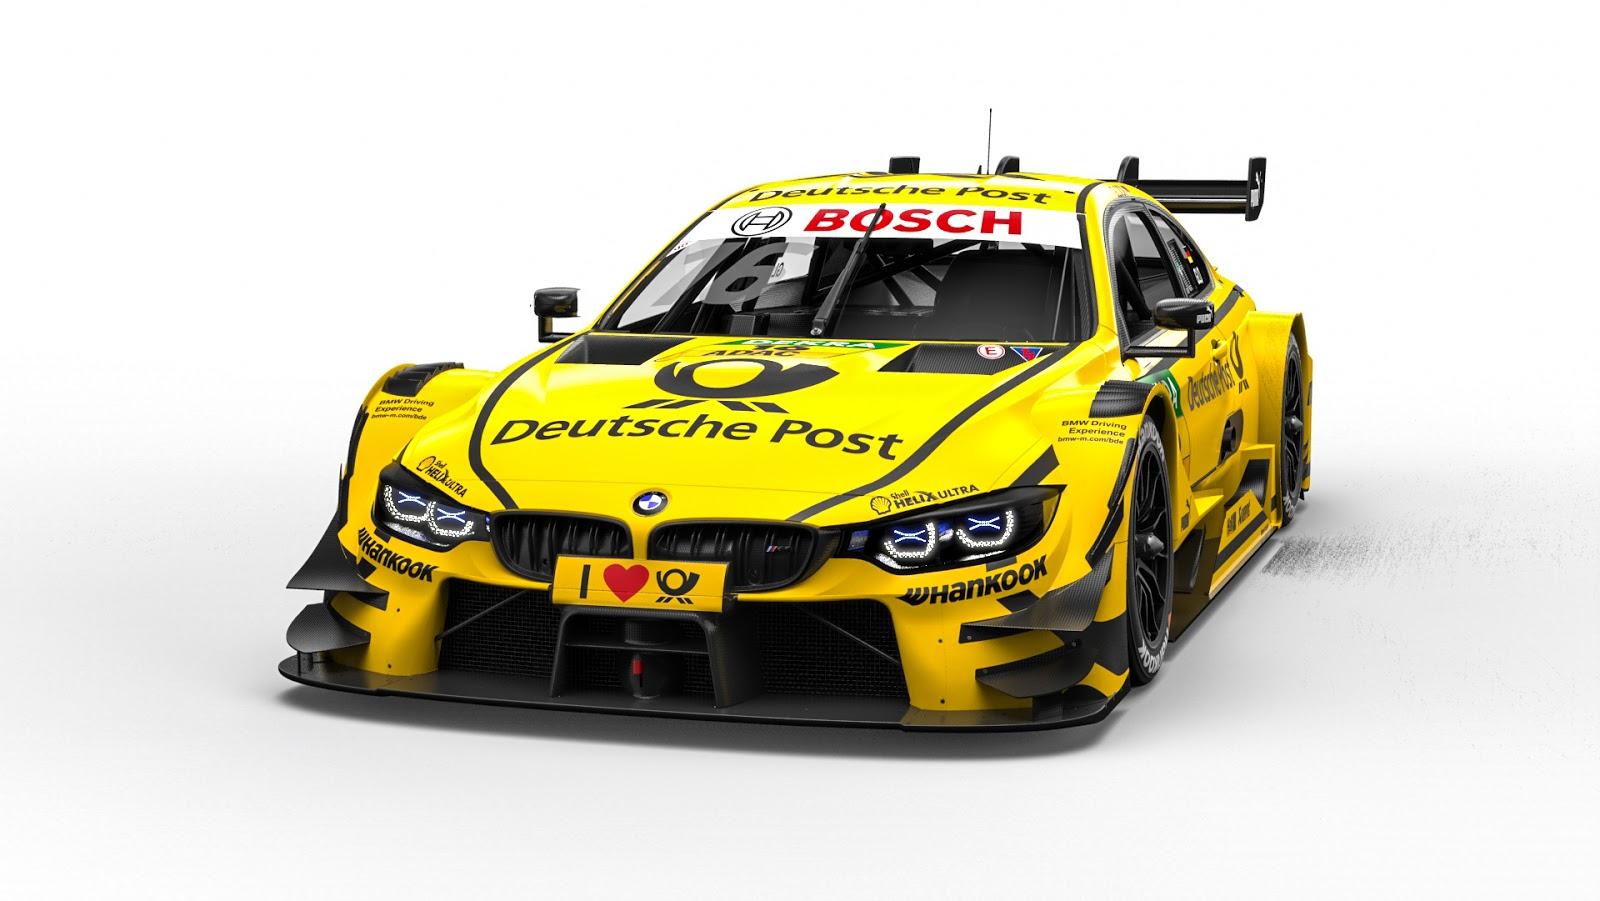 P90255227 highRes 21st april 2017 muni Η BMW Motorsport ξεκινά τη νέα σεζόν με ισχυρούς εταίρους Akrapovič, BMW, Bmw Bank, BMW M4 DTM, BMW M6, BMW M6 GT3, BMW Motorsport, DTM, Red Bull, Samsung, Shell, αγωνες